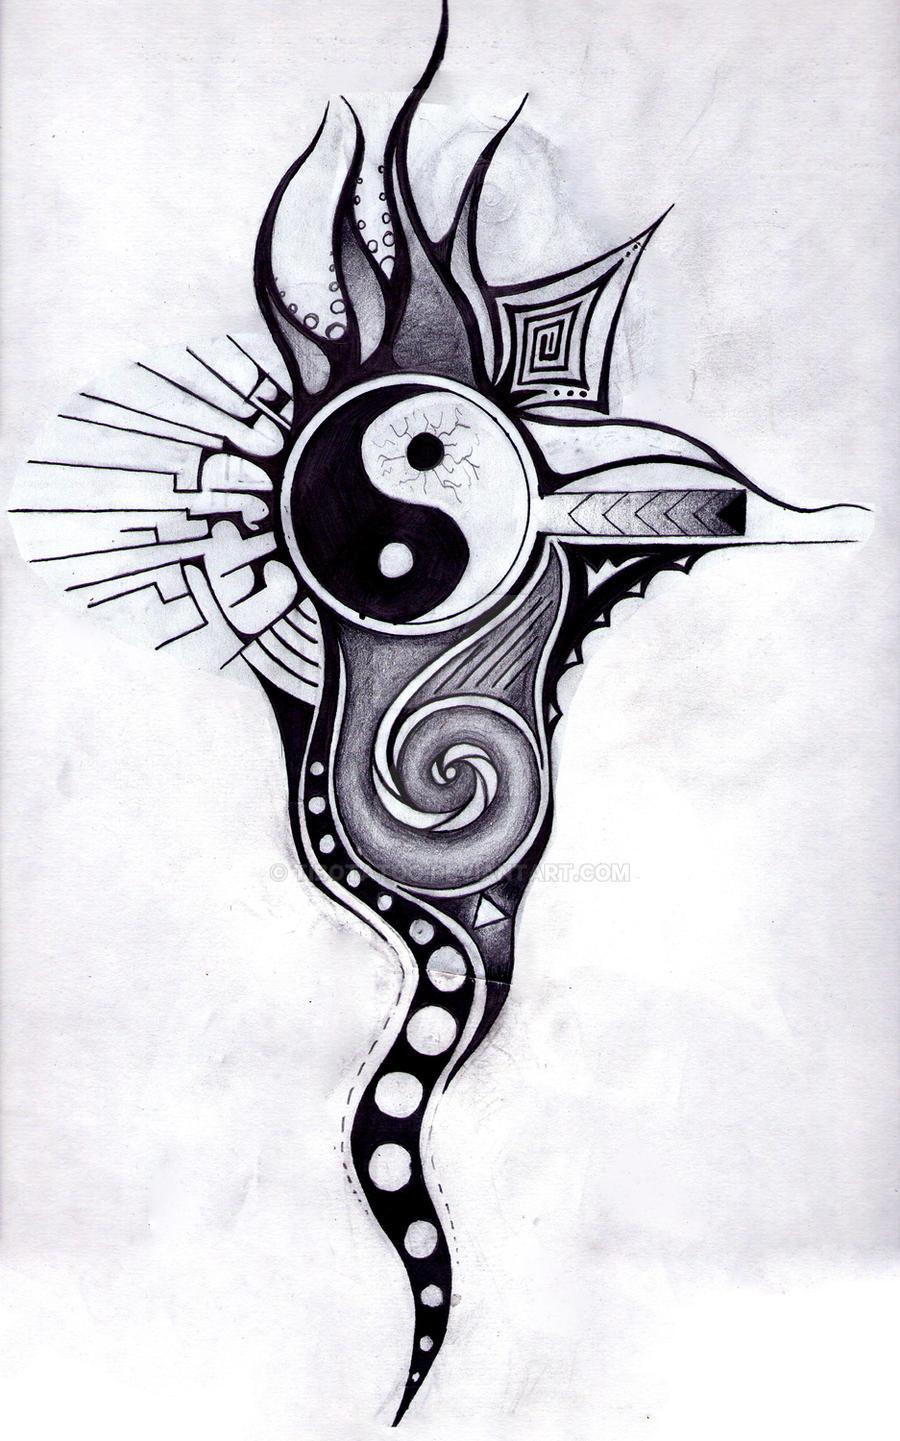 Ying yang black tattoo by tibotatoo on deviantart - Tatouage ying yang ...